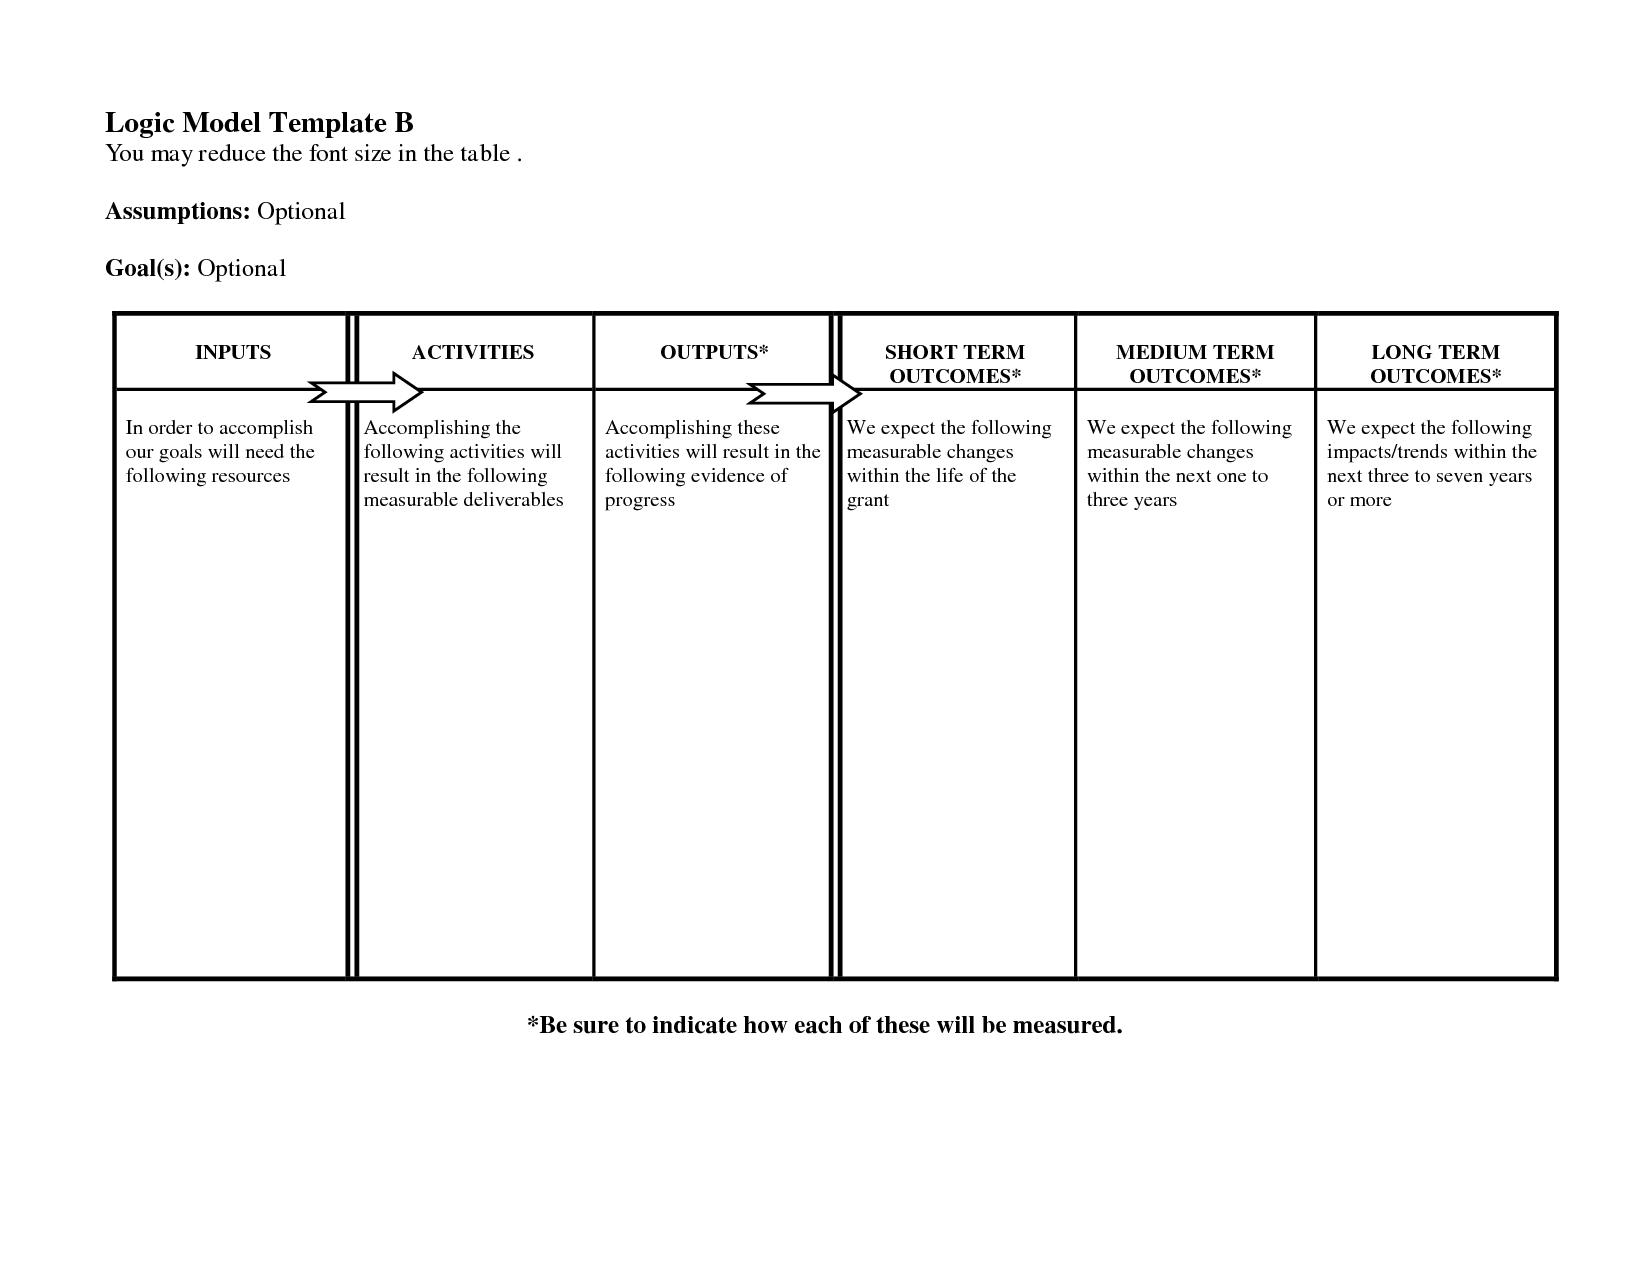 Free Logic Templates Download ] - Of Social Media Marketing In Logic Model Template Microsoft Word